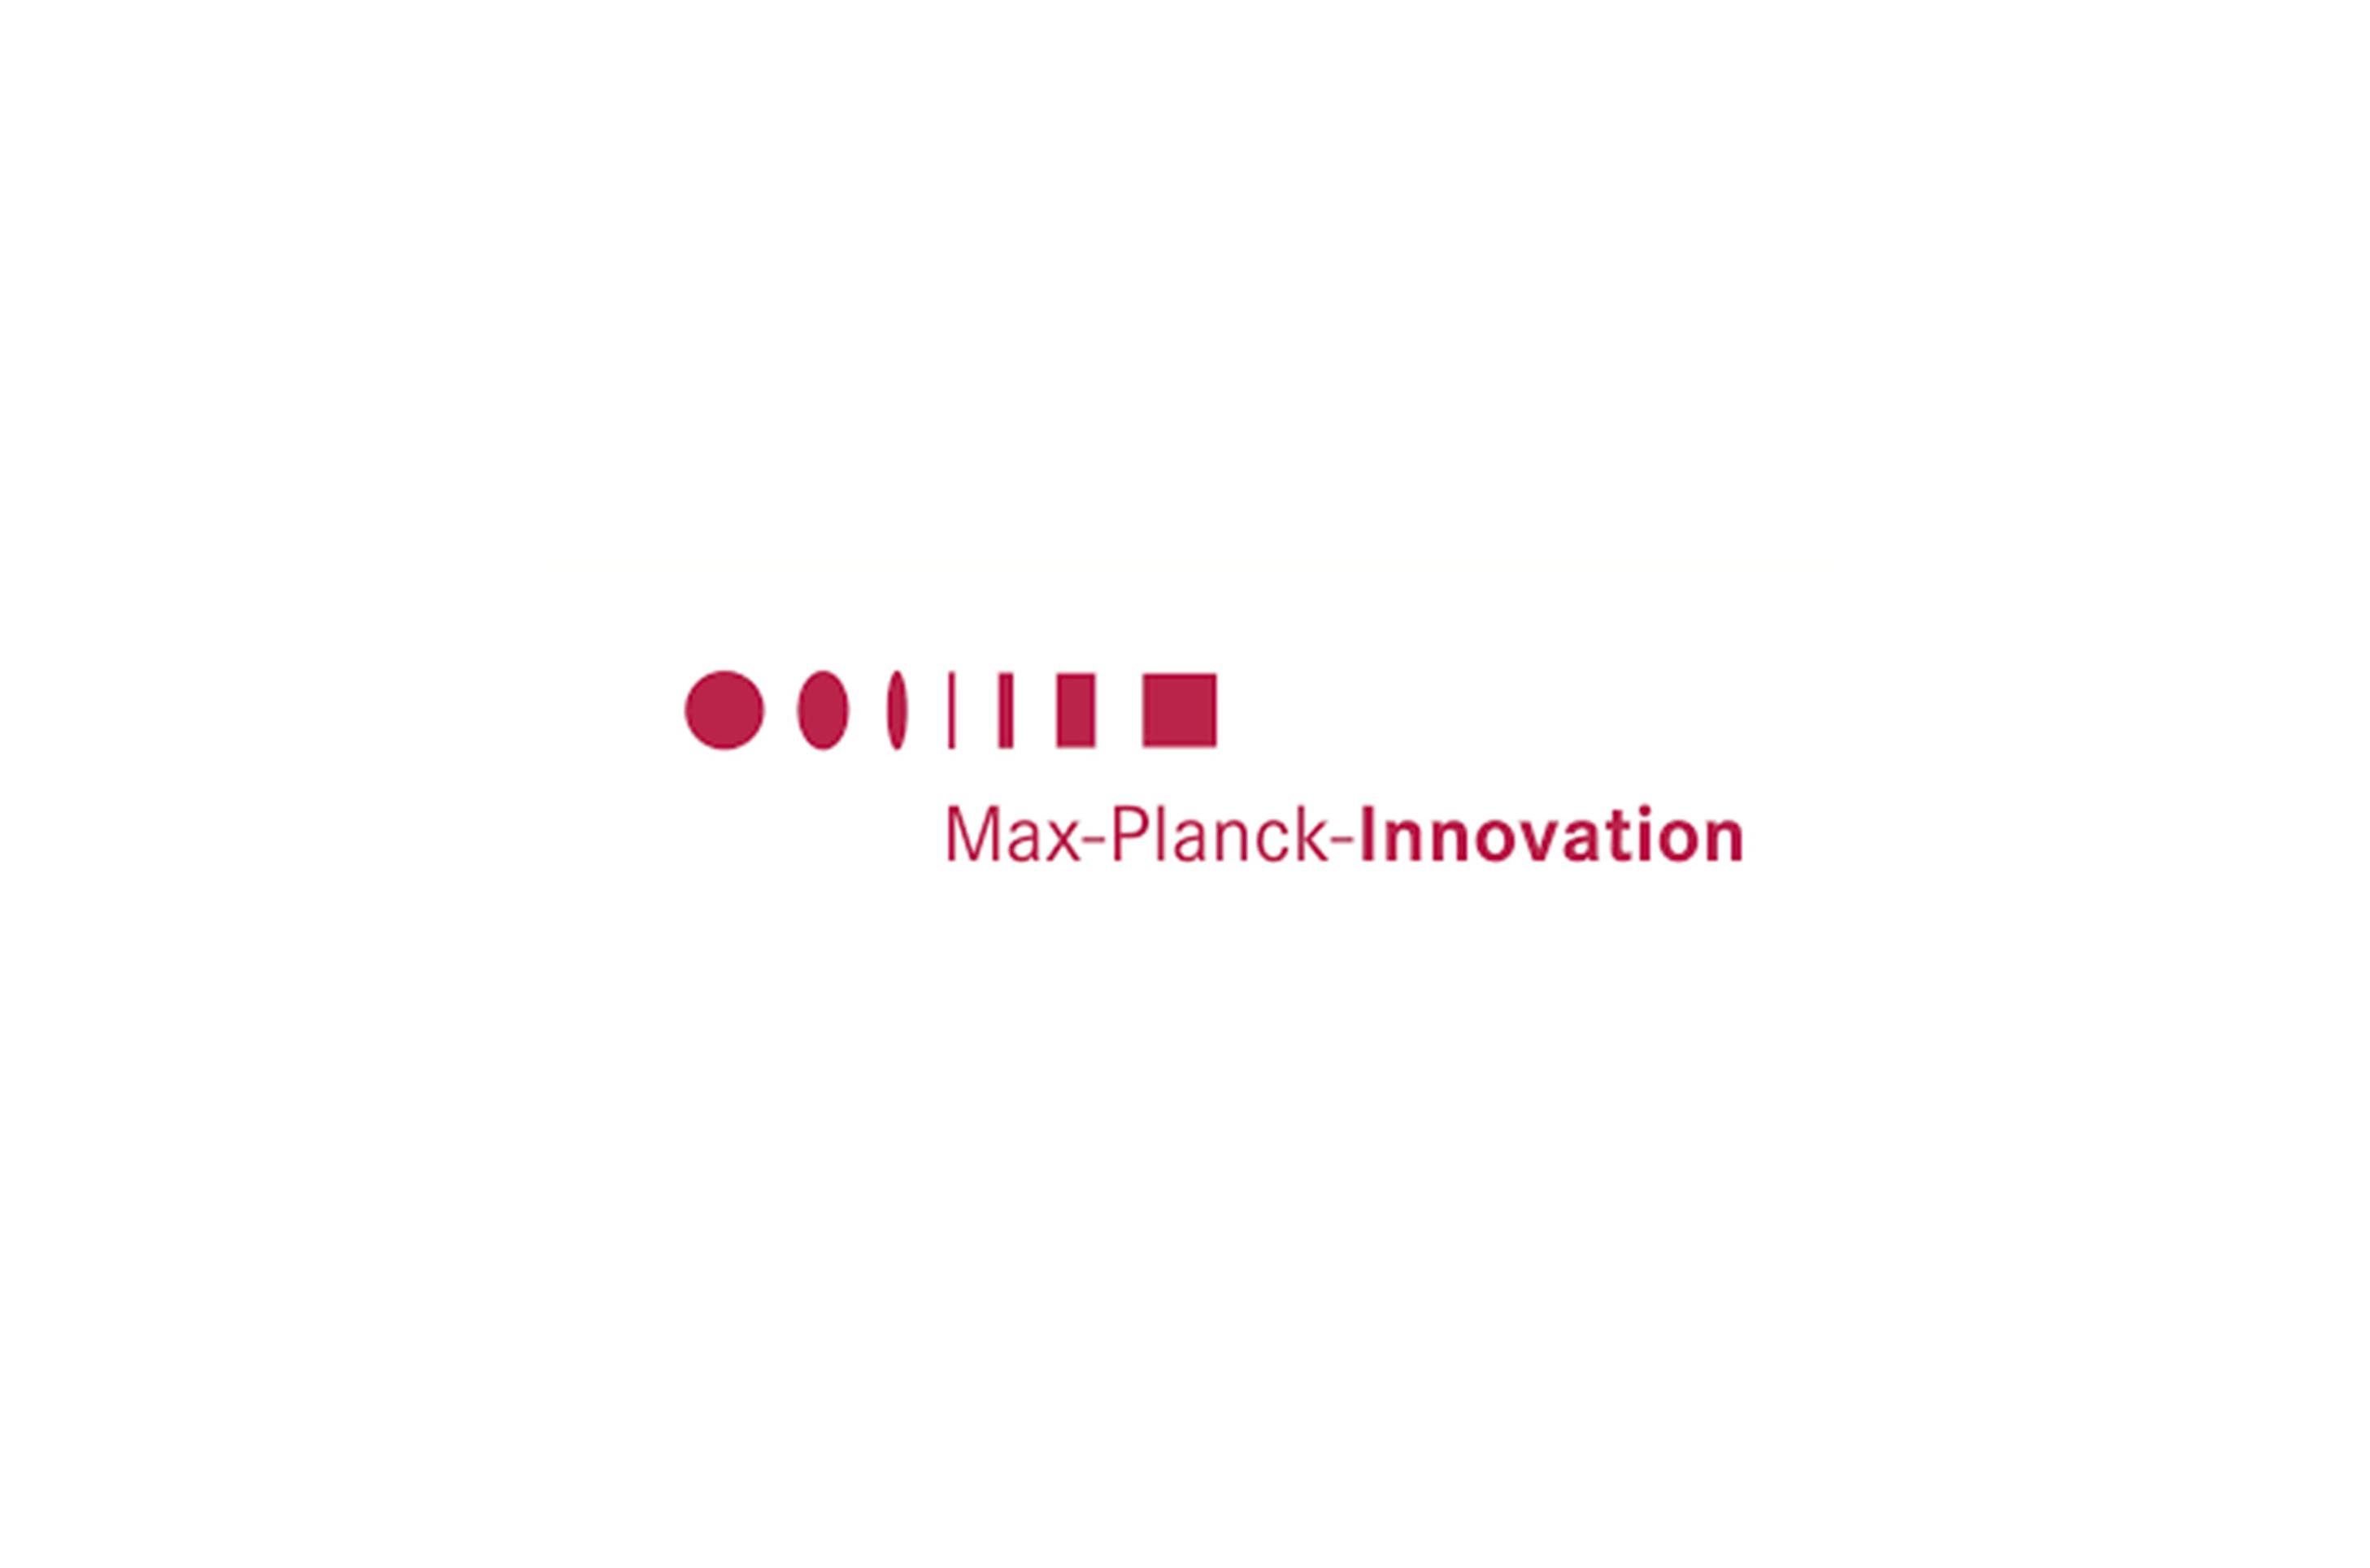 Prokando_Referenzen__0005_-max_planck